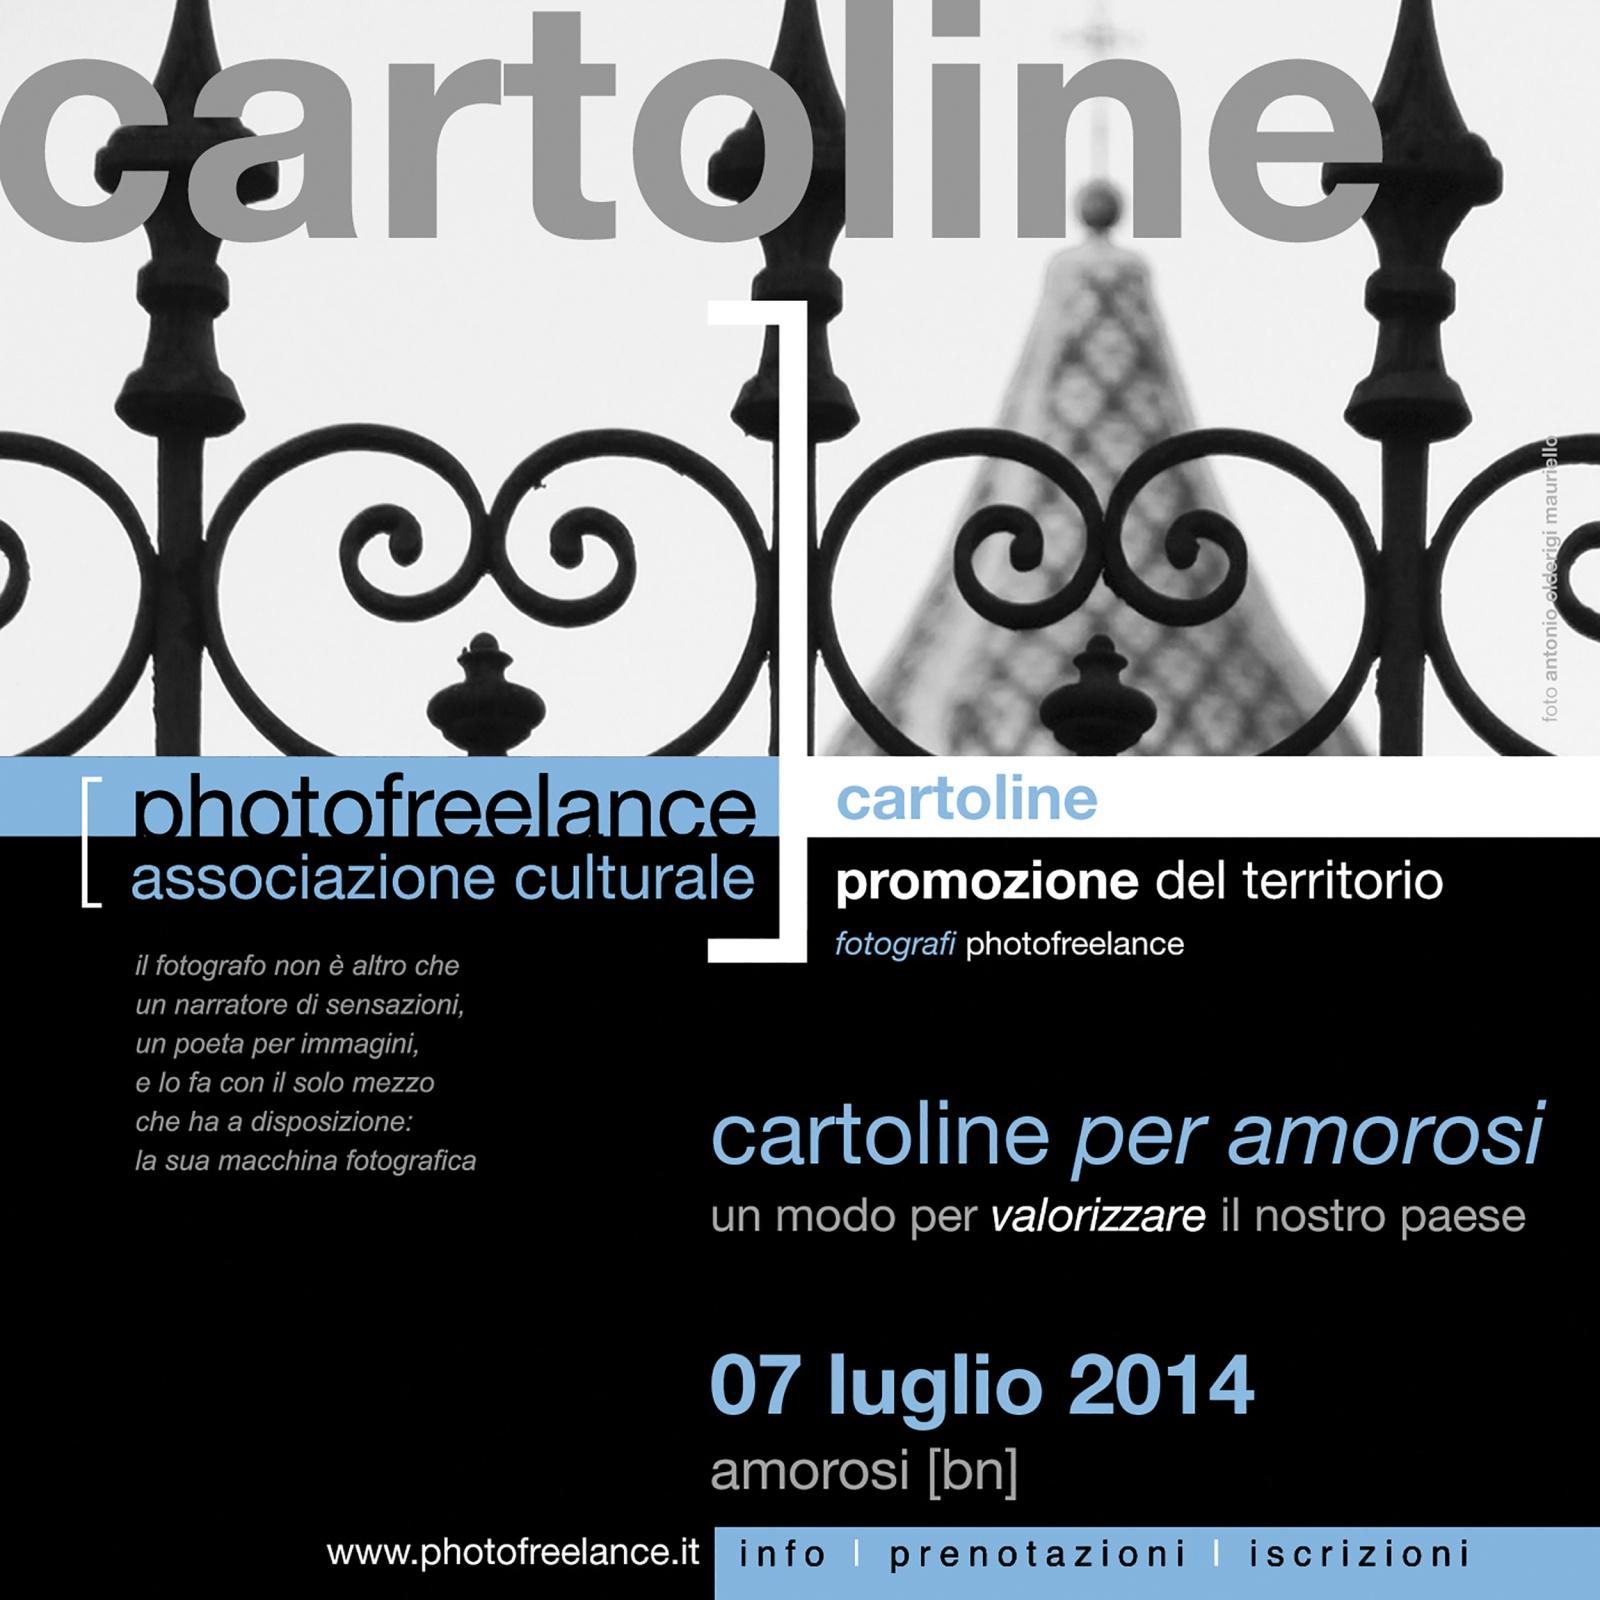 cartoline per amorosi 2014